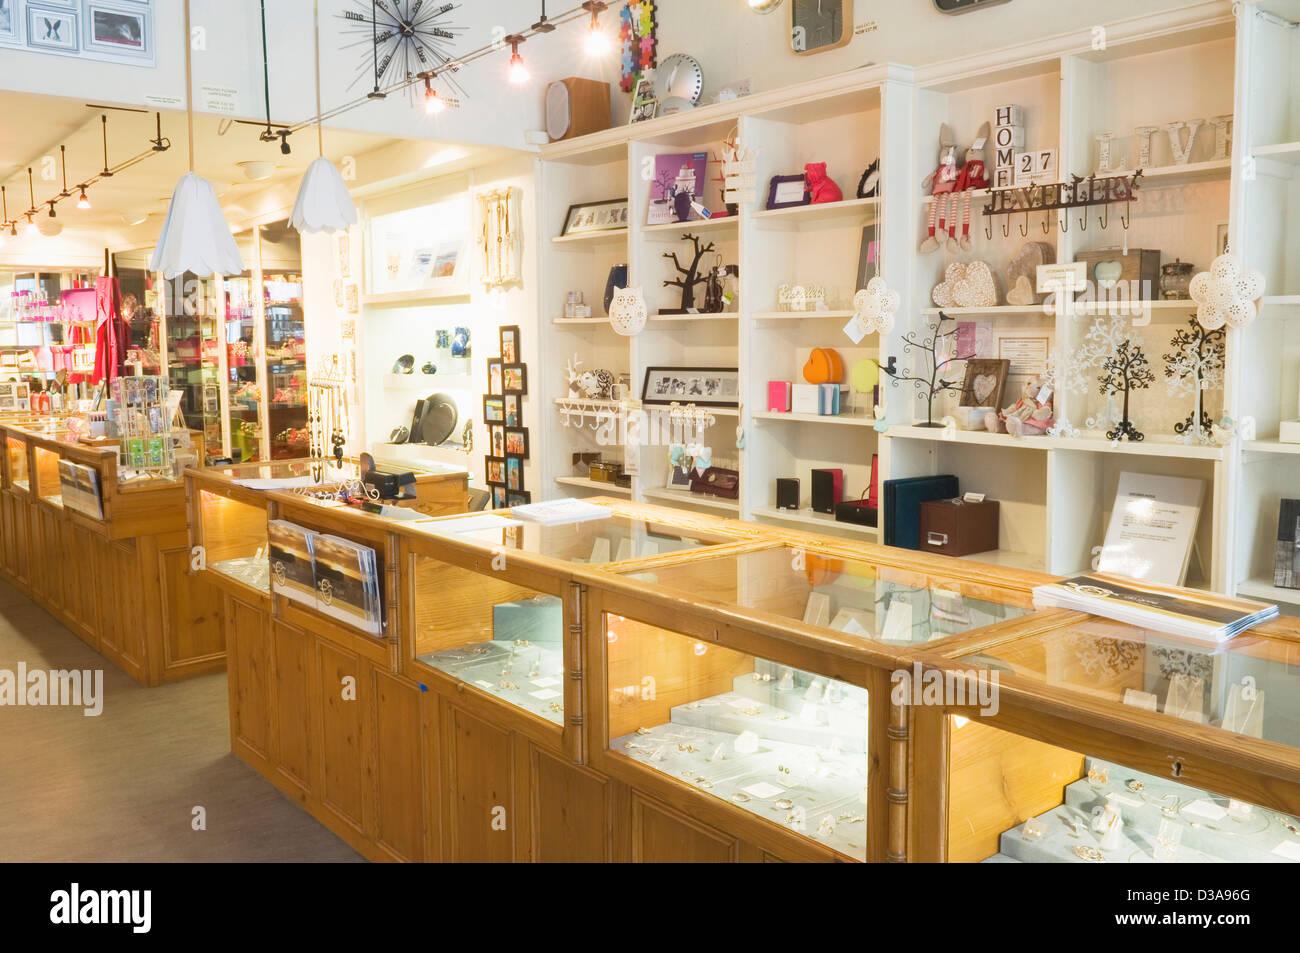 Interieur eines modernen Geschenk-Shops in Kirkwall, Orkney Inseln ...